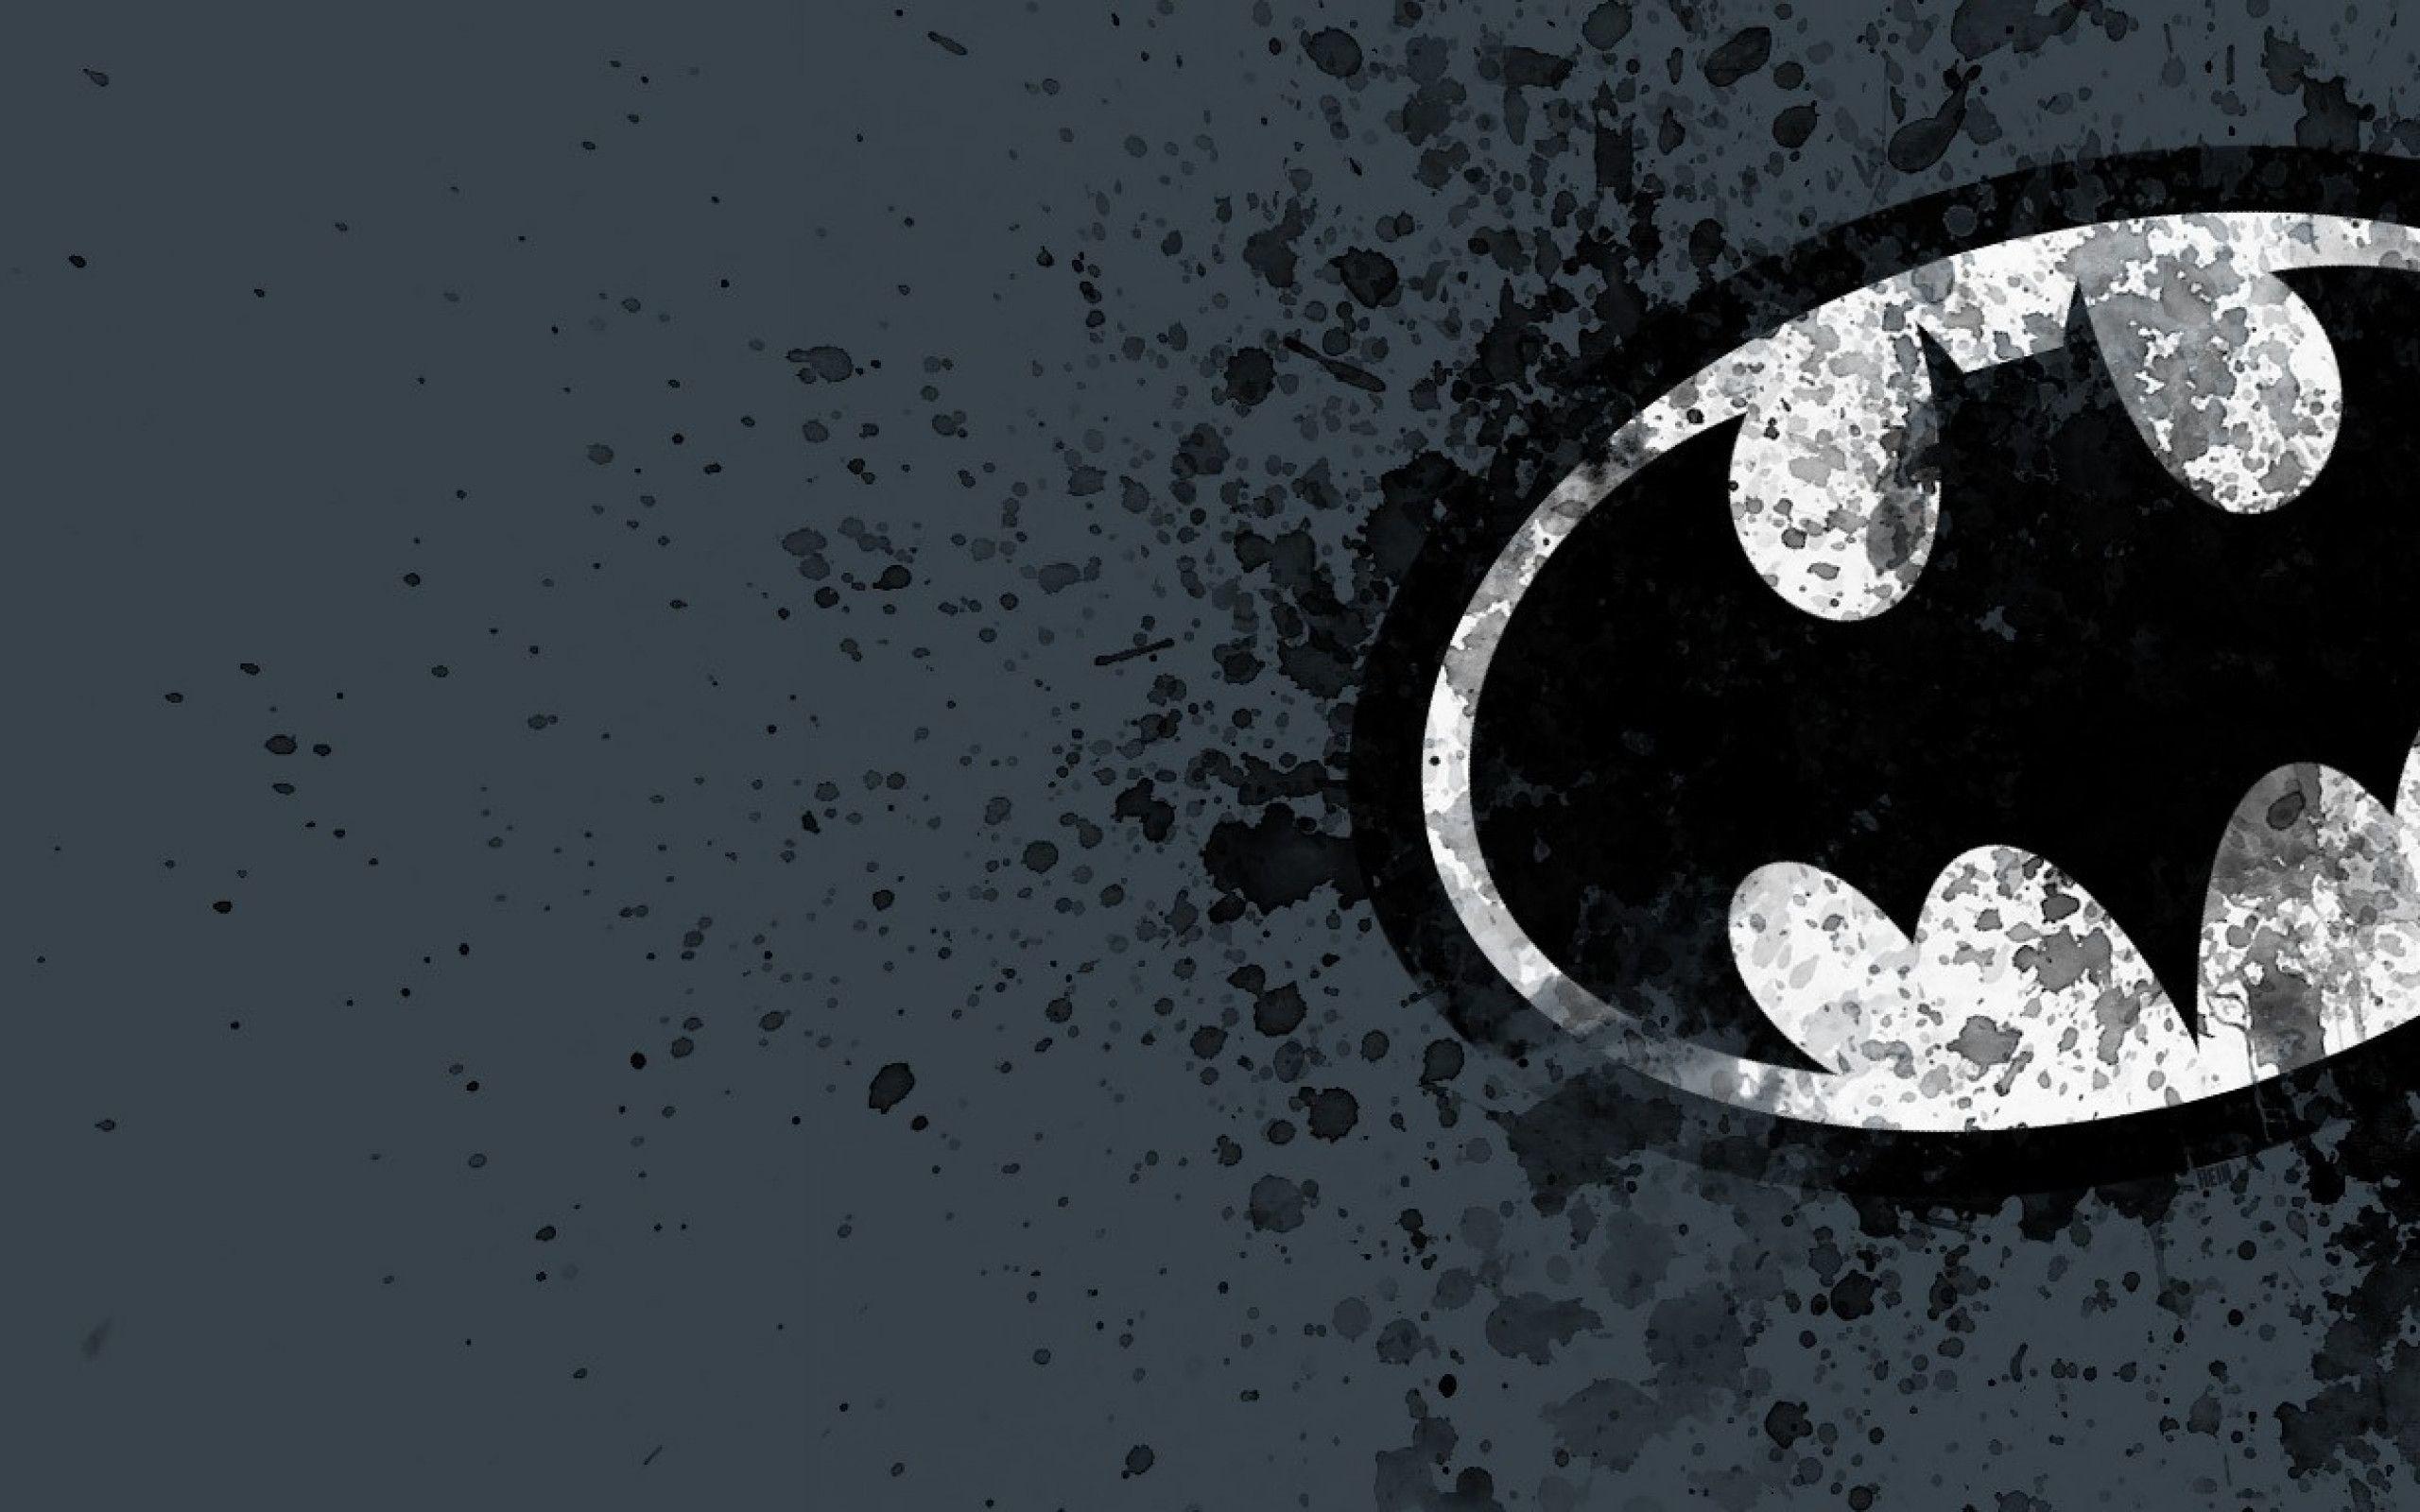 Batman Wallpapers – Full HD wallpaper search